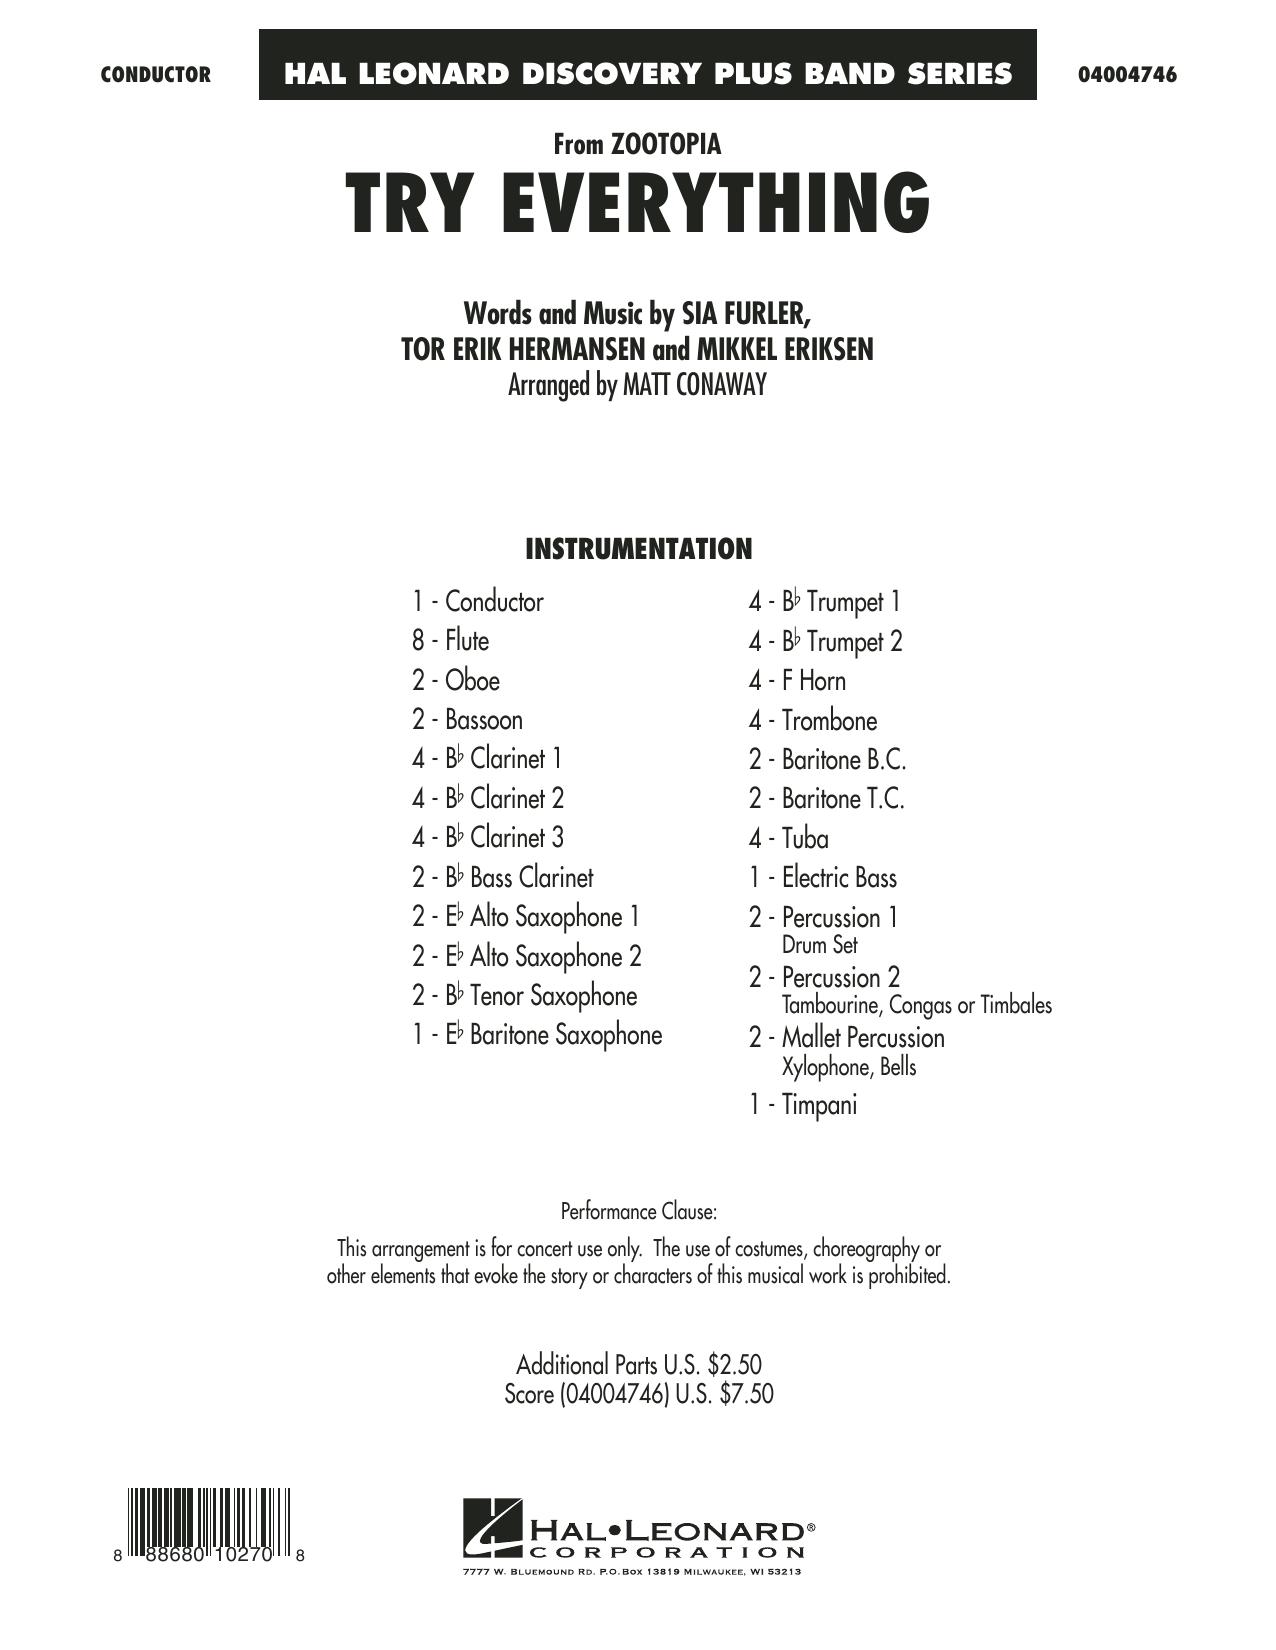 Matt Conaway Try Everything From Zootopia Full Score Sheet Music Download Pdf Score 352055